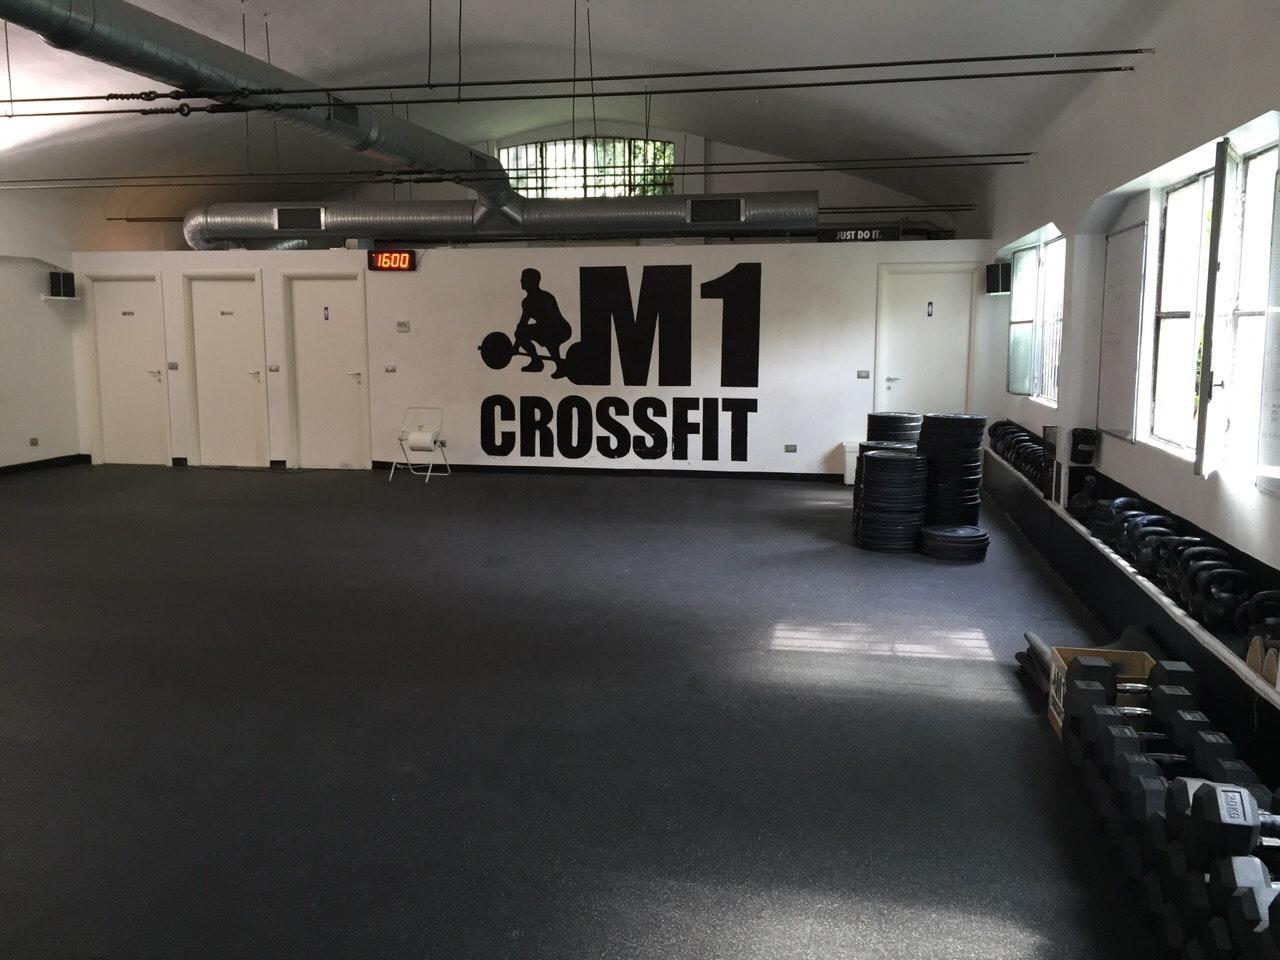 CROSSFIT M1